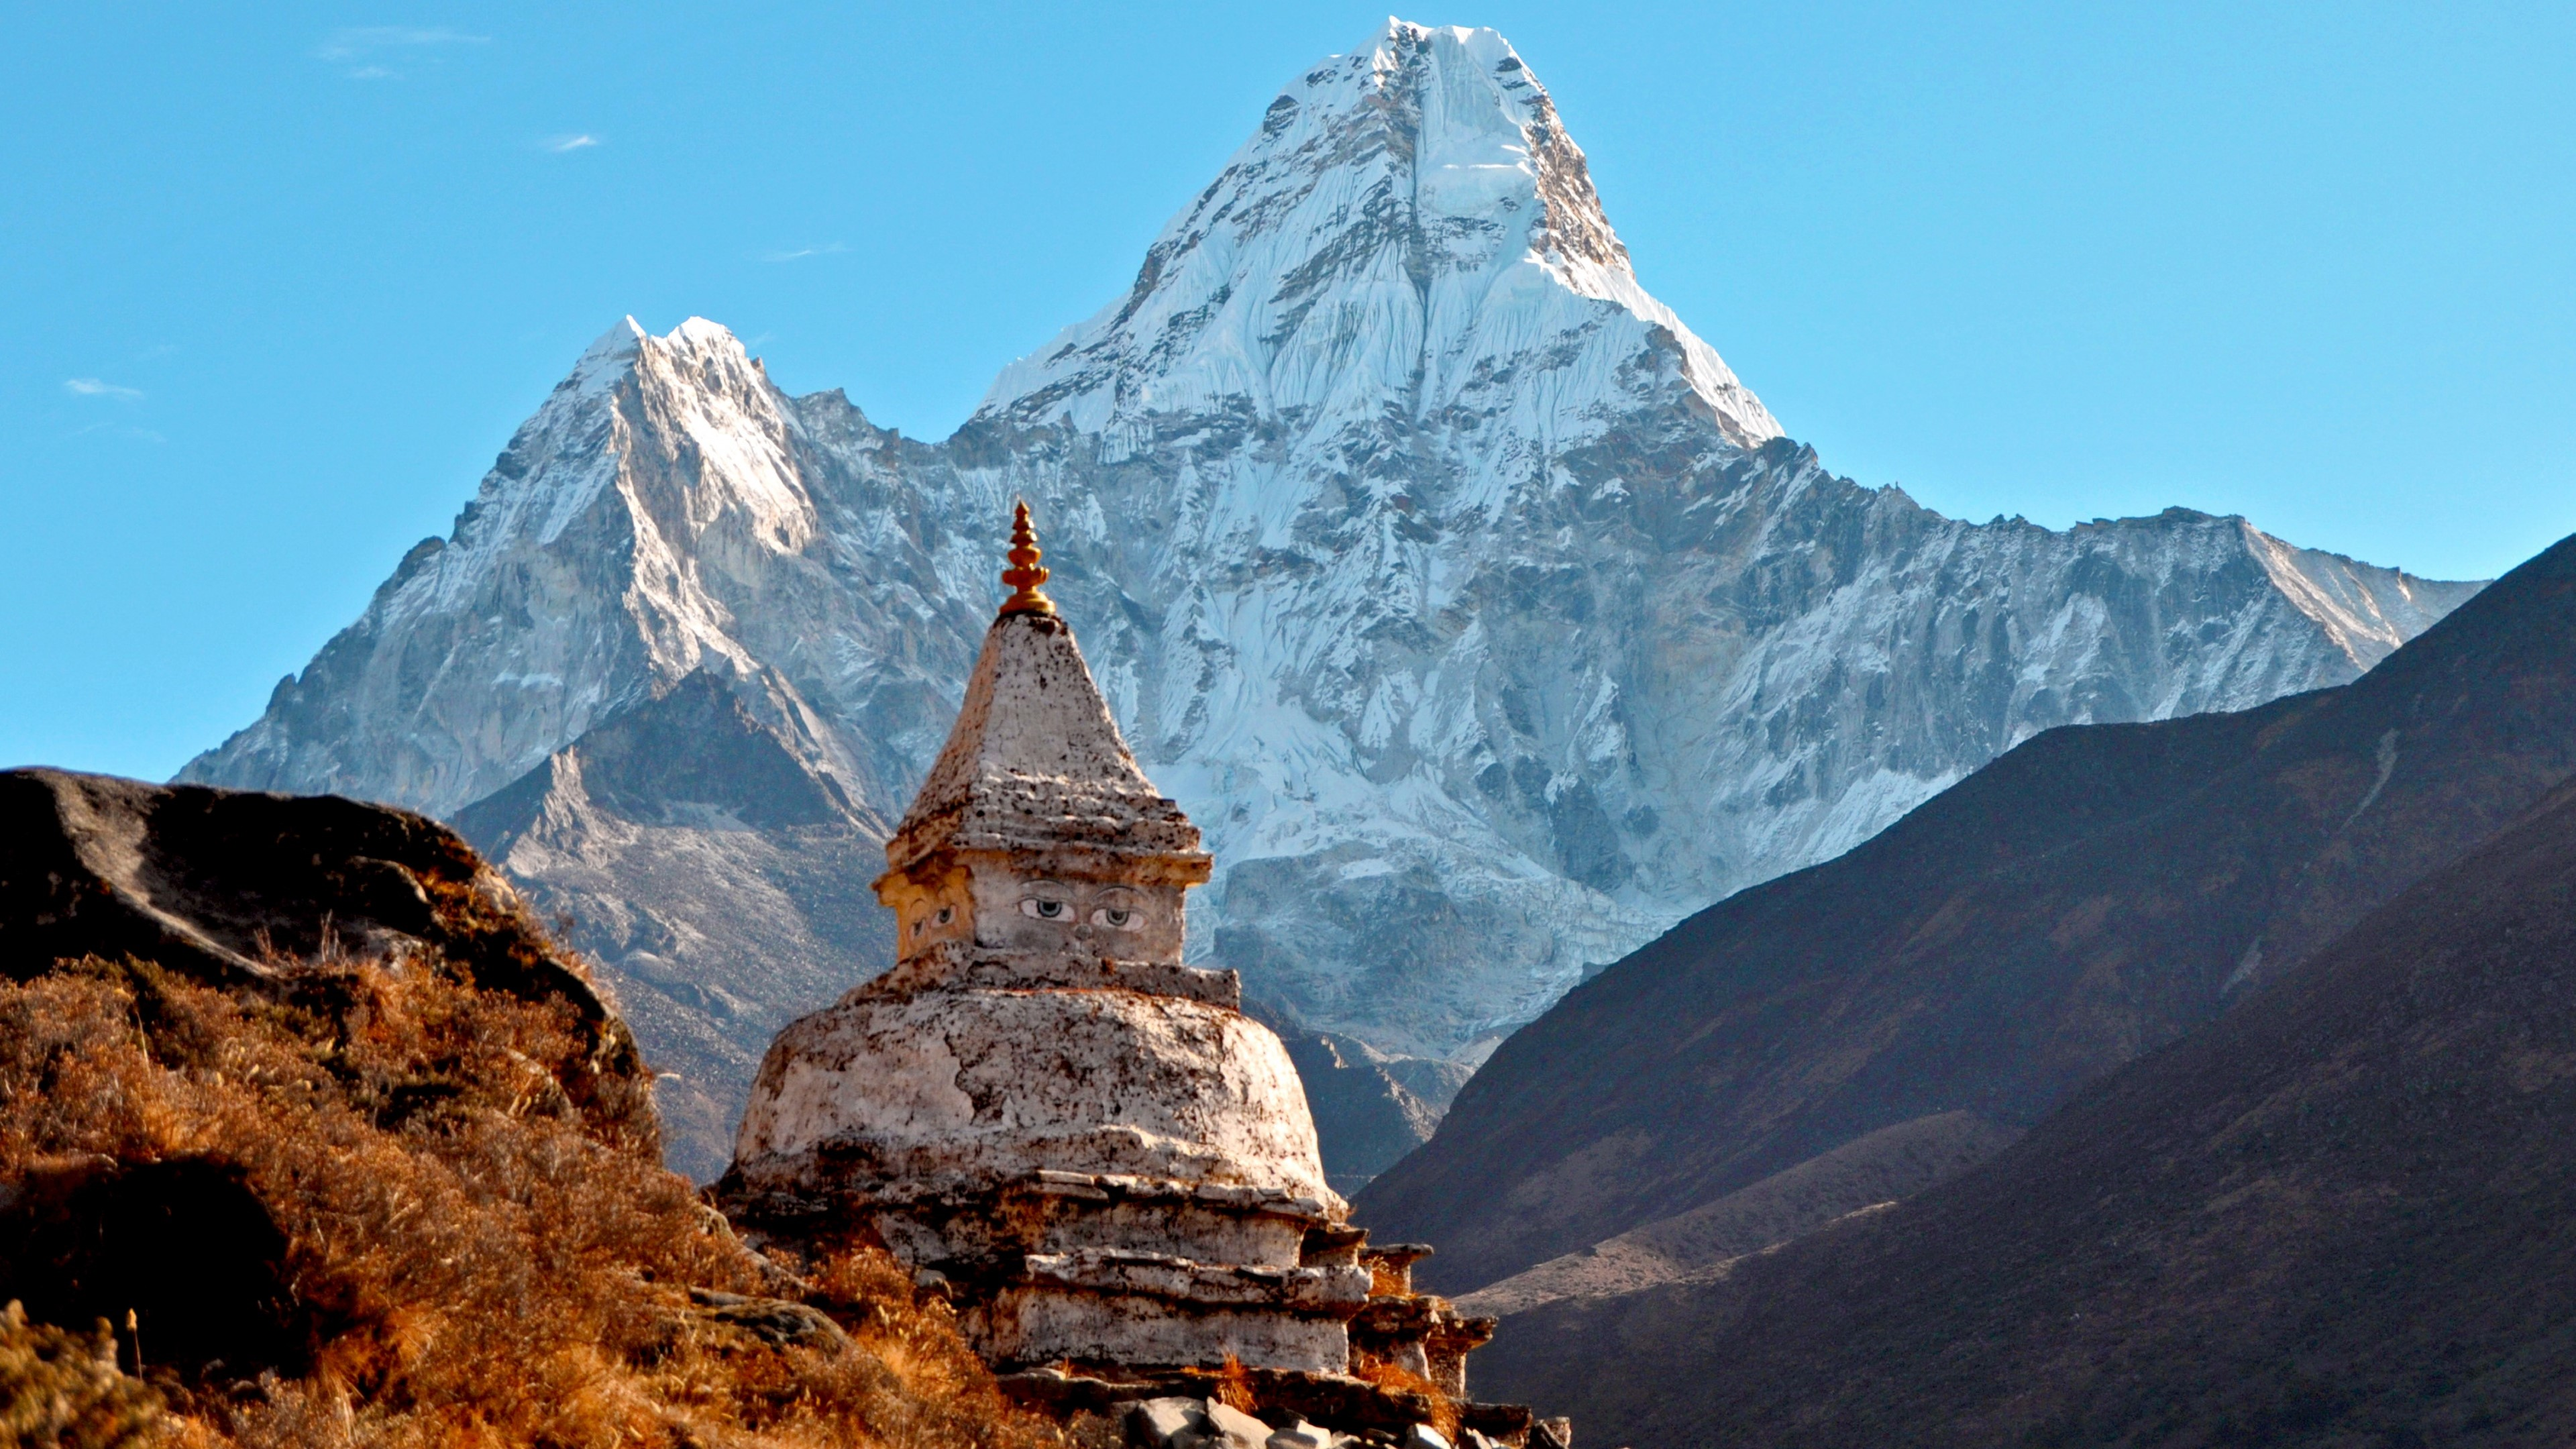 Wallpaper Ama Dablam Temple in the Himalayas